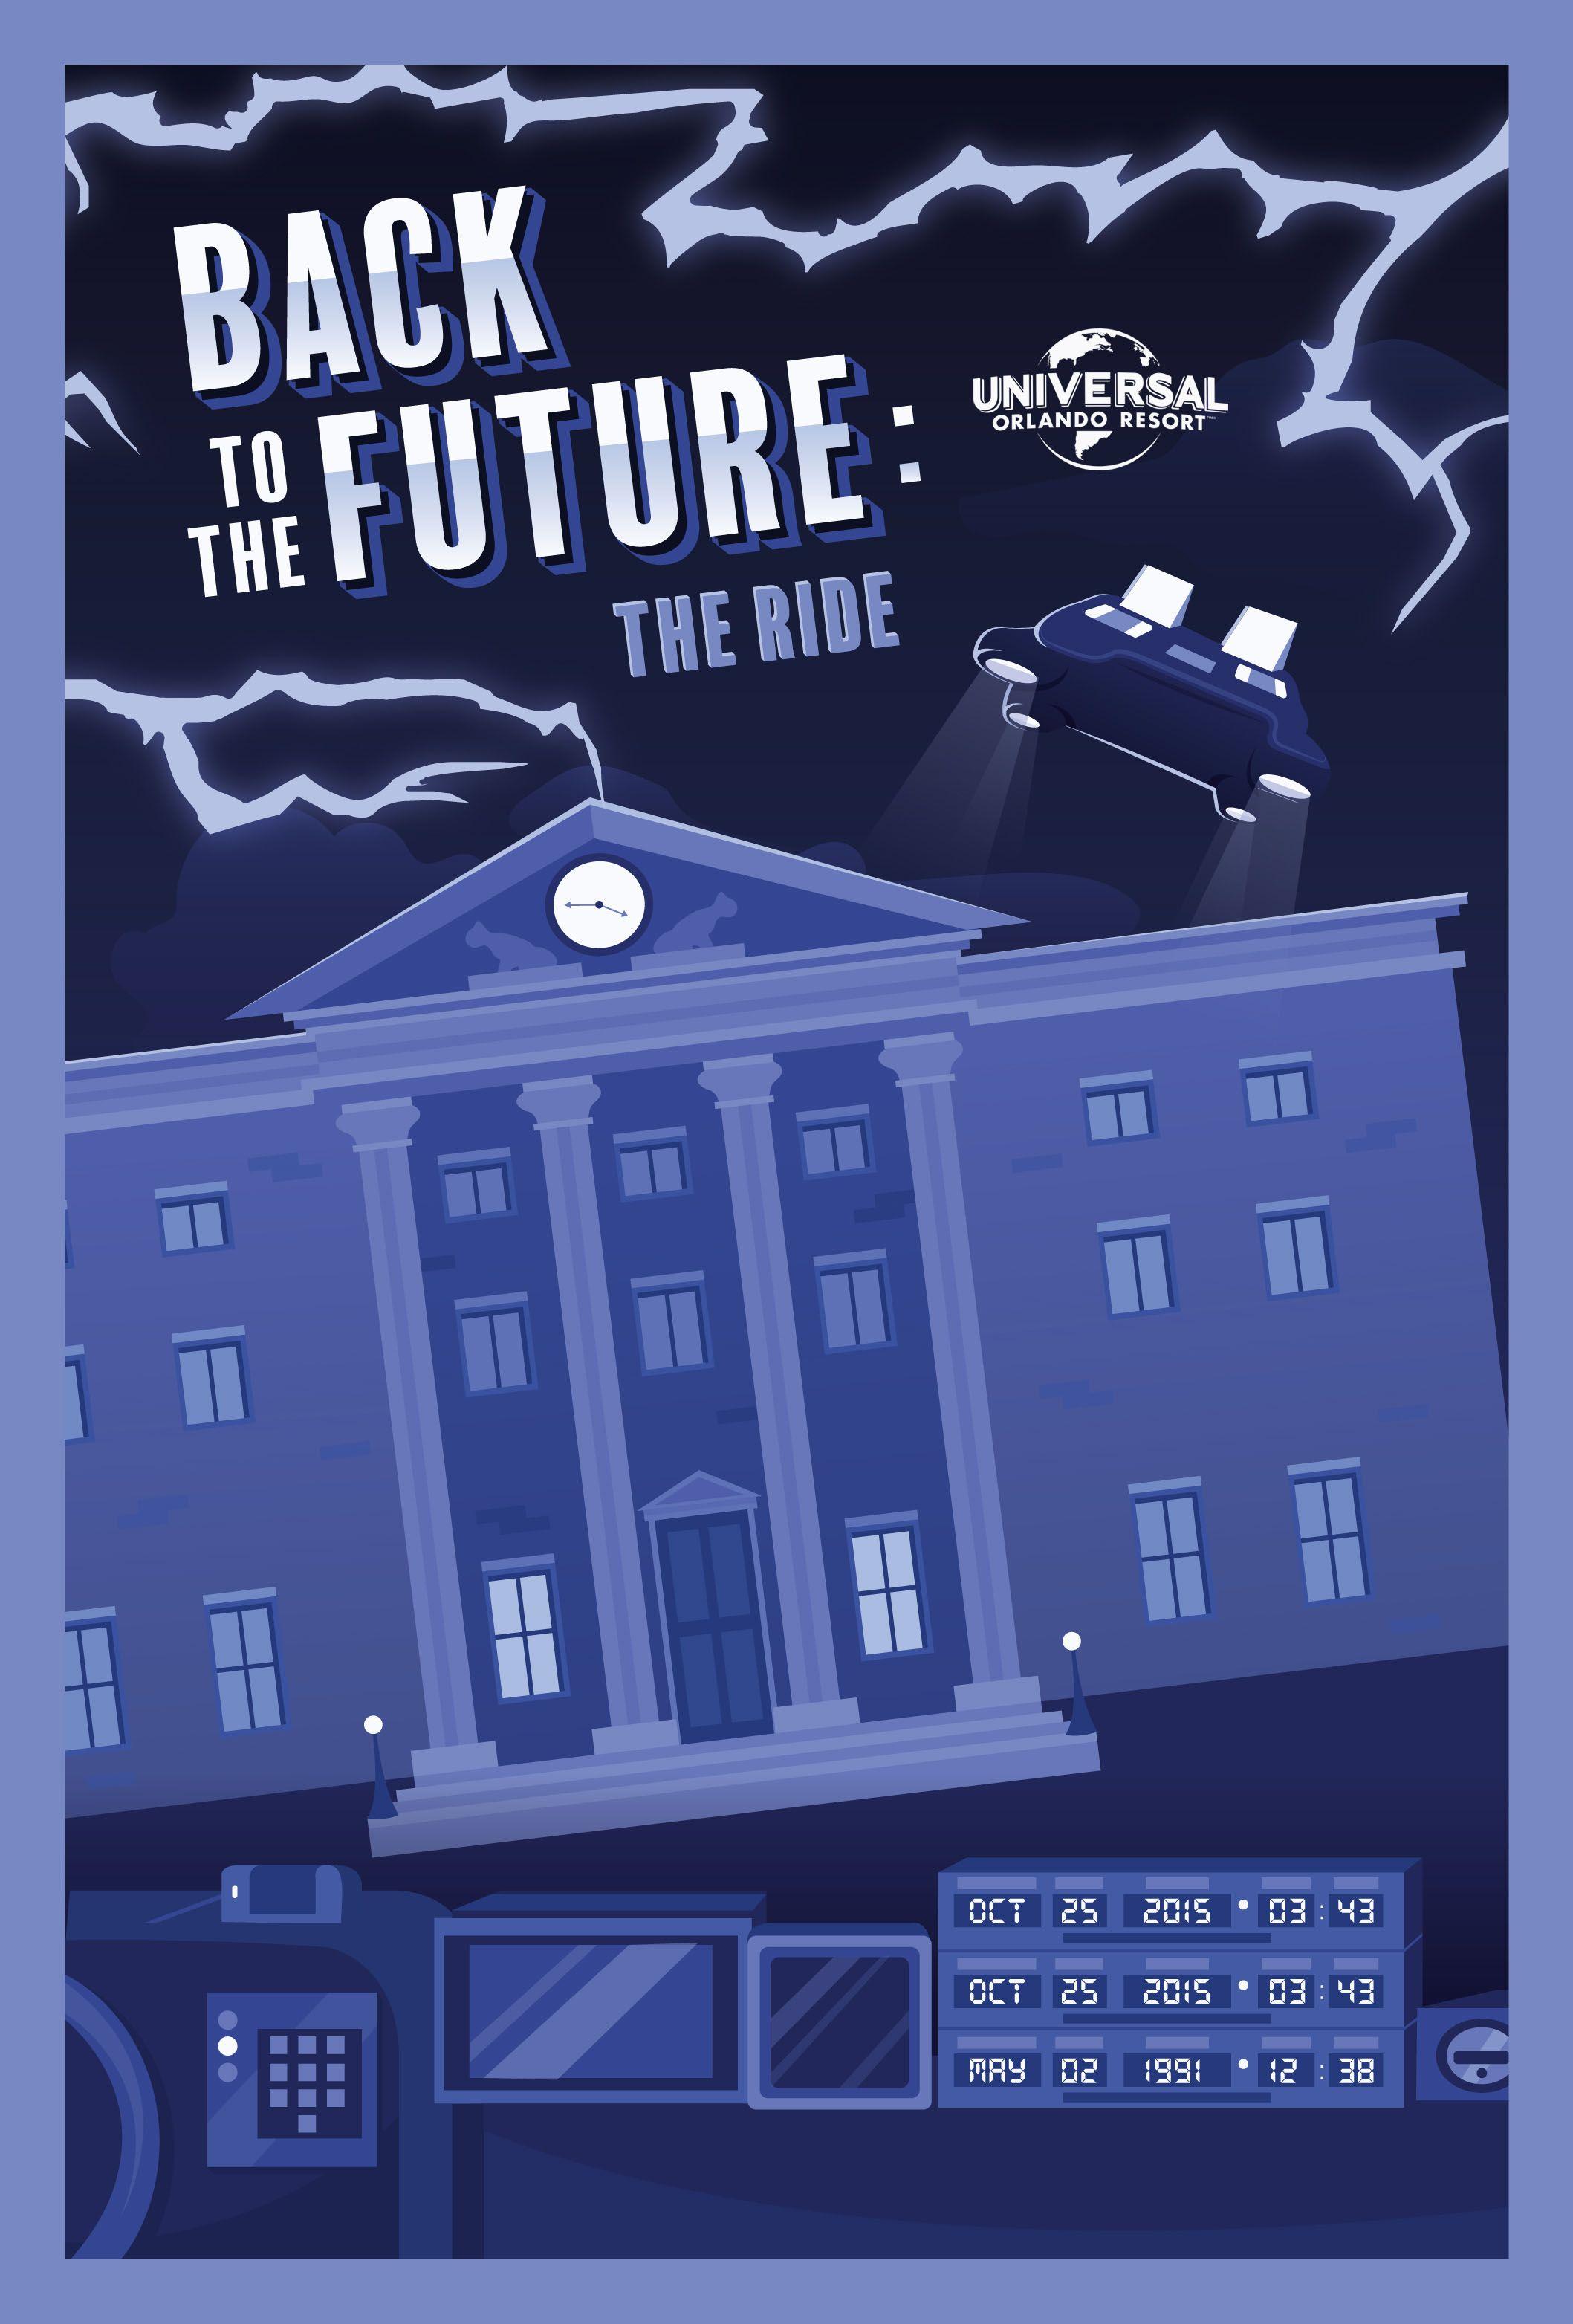 Retro Back to the Future poster